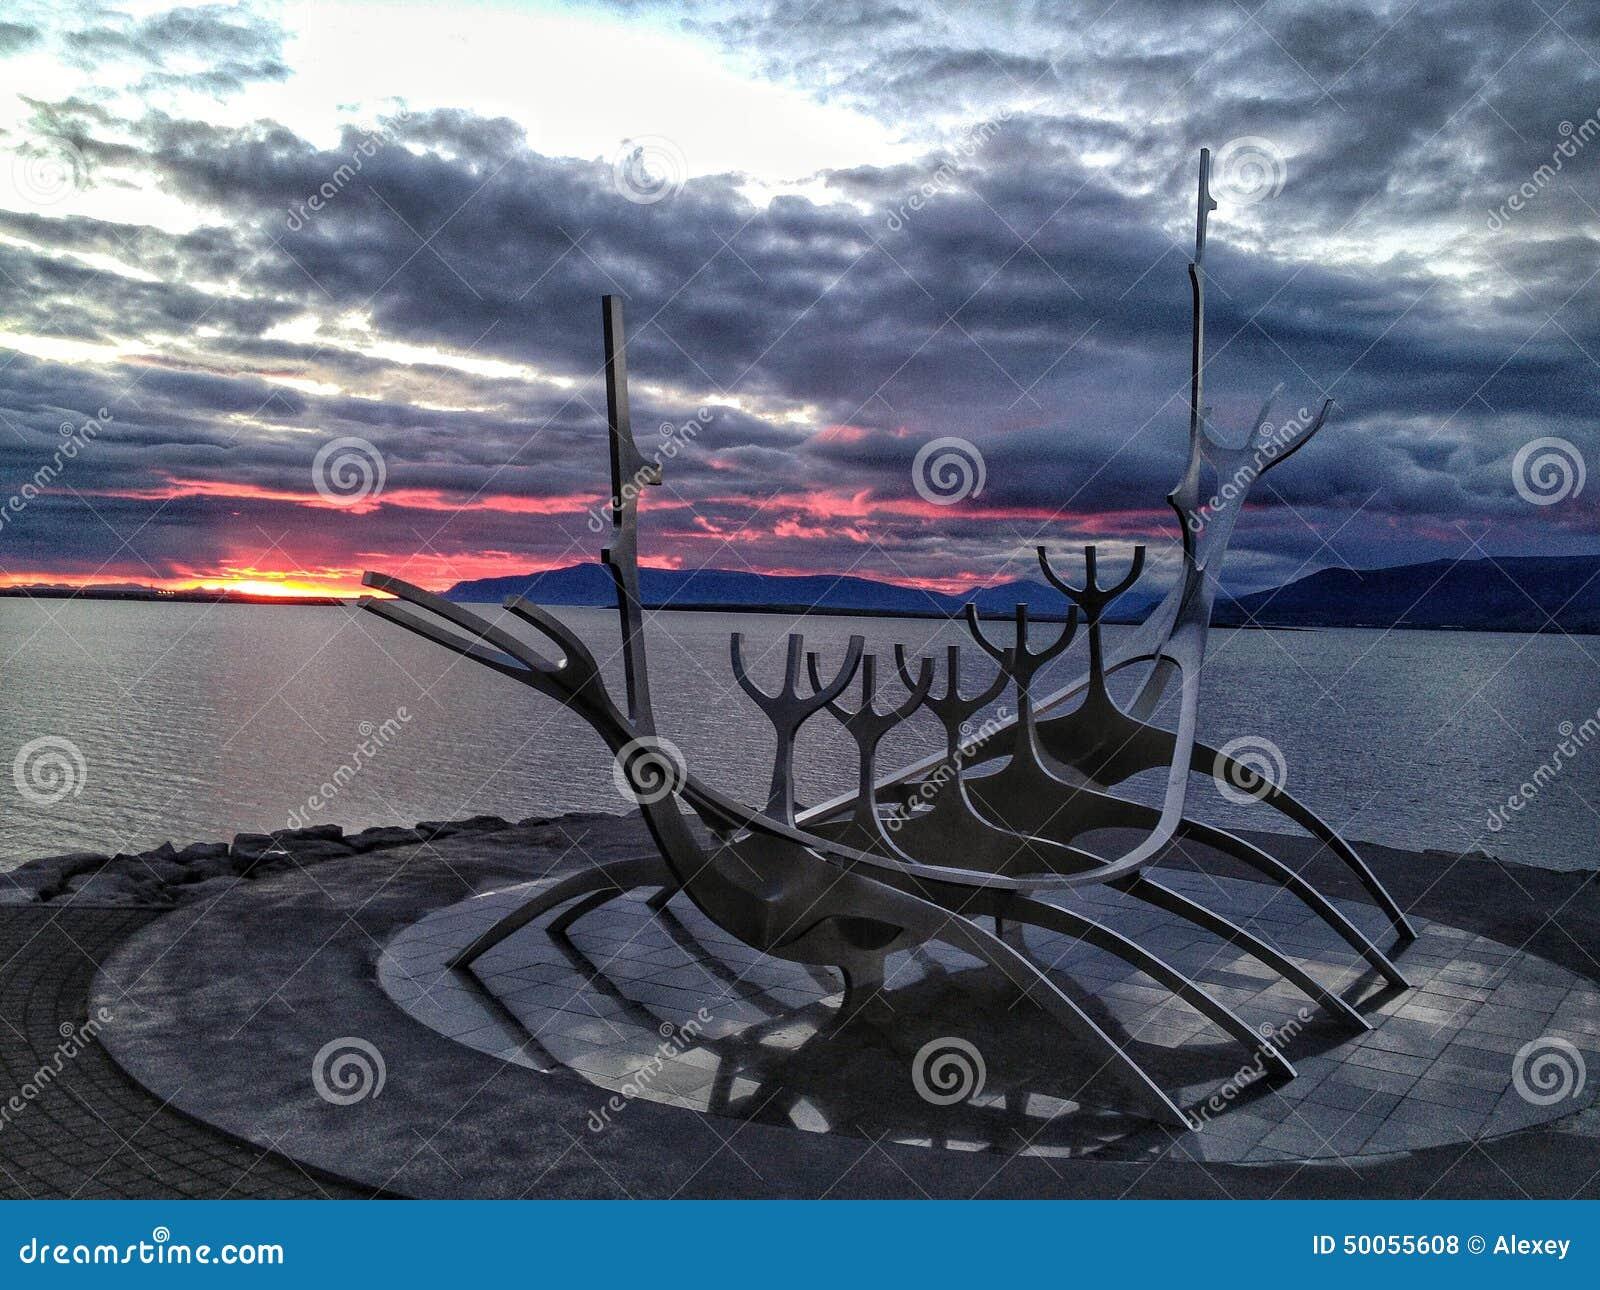 Vikings Boat, Reykjavik, Iceland